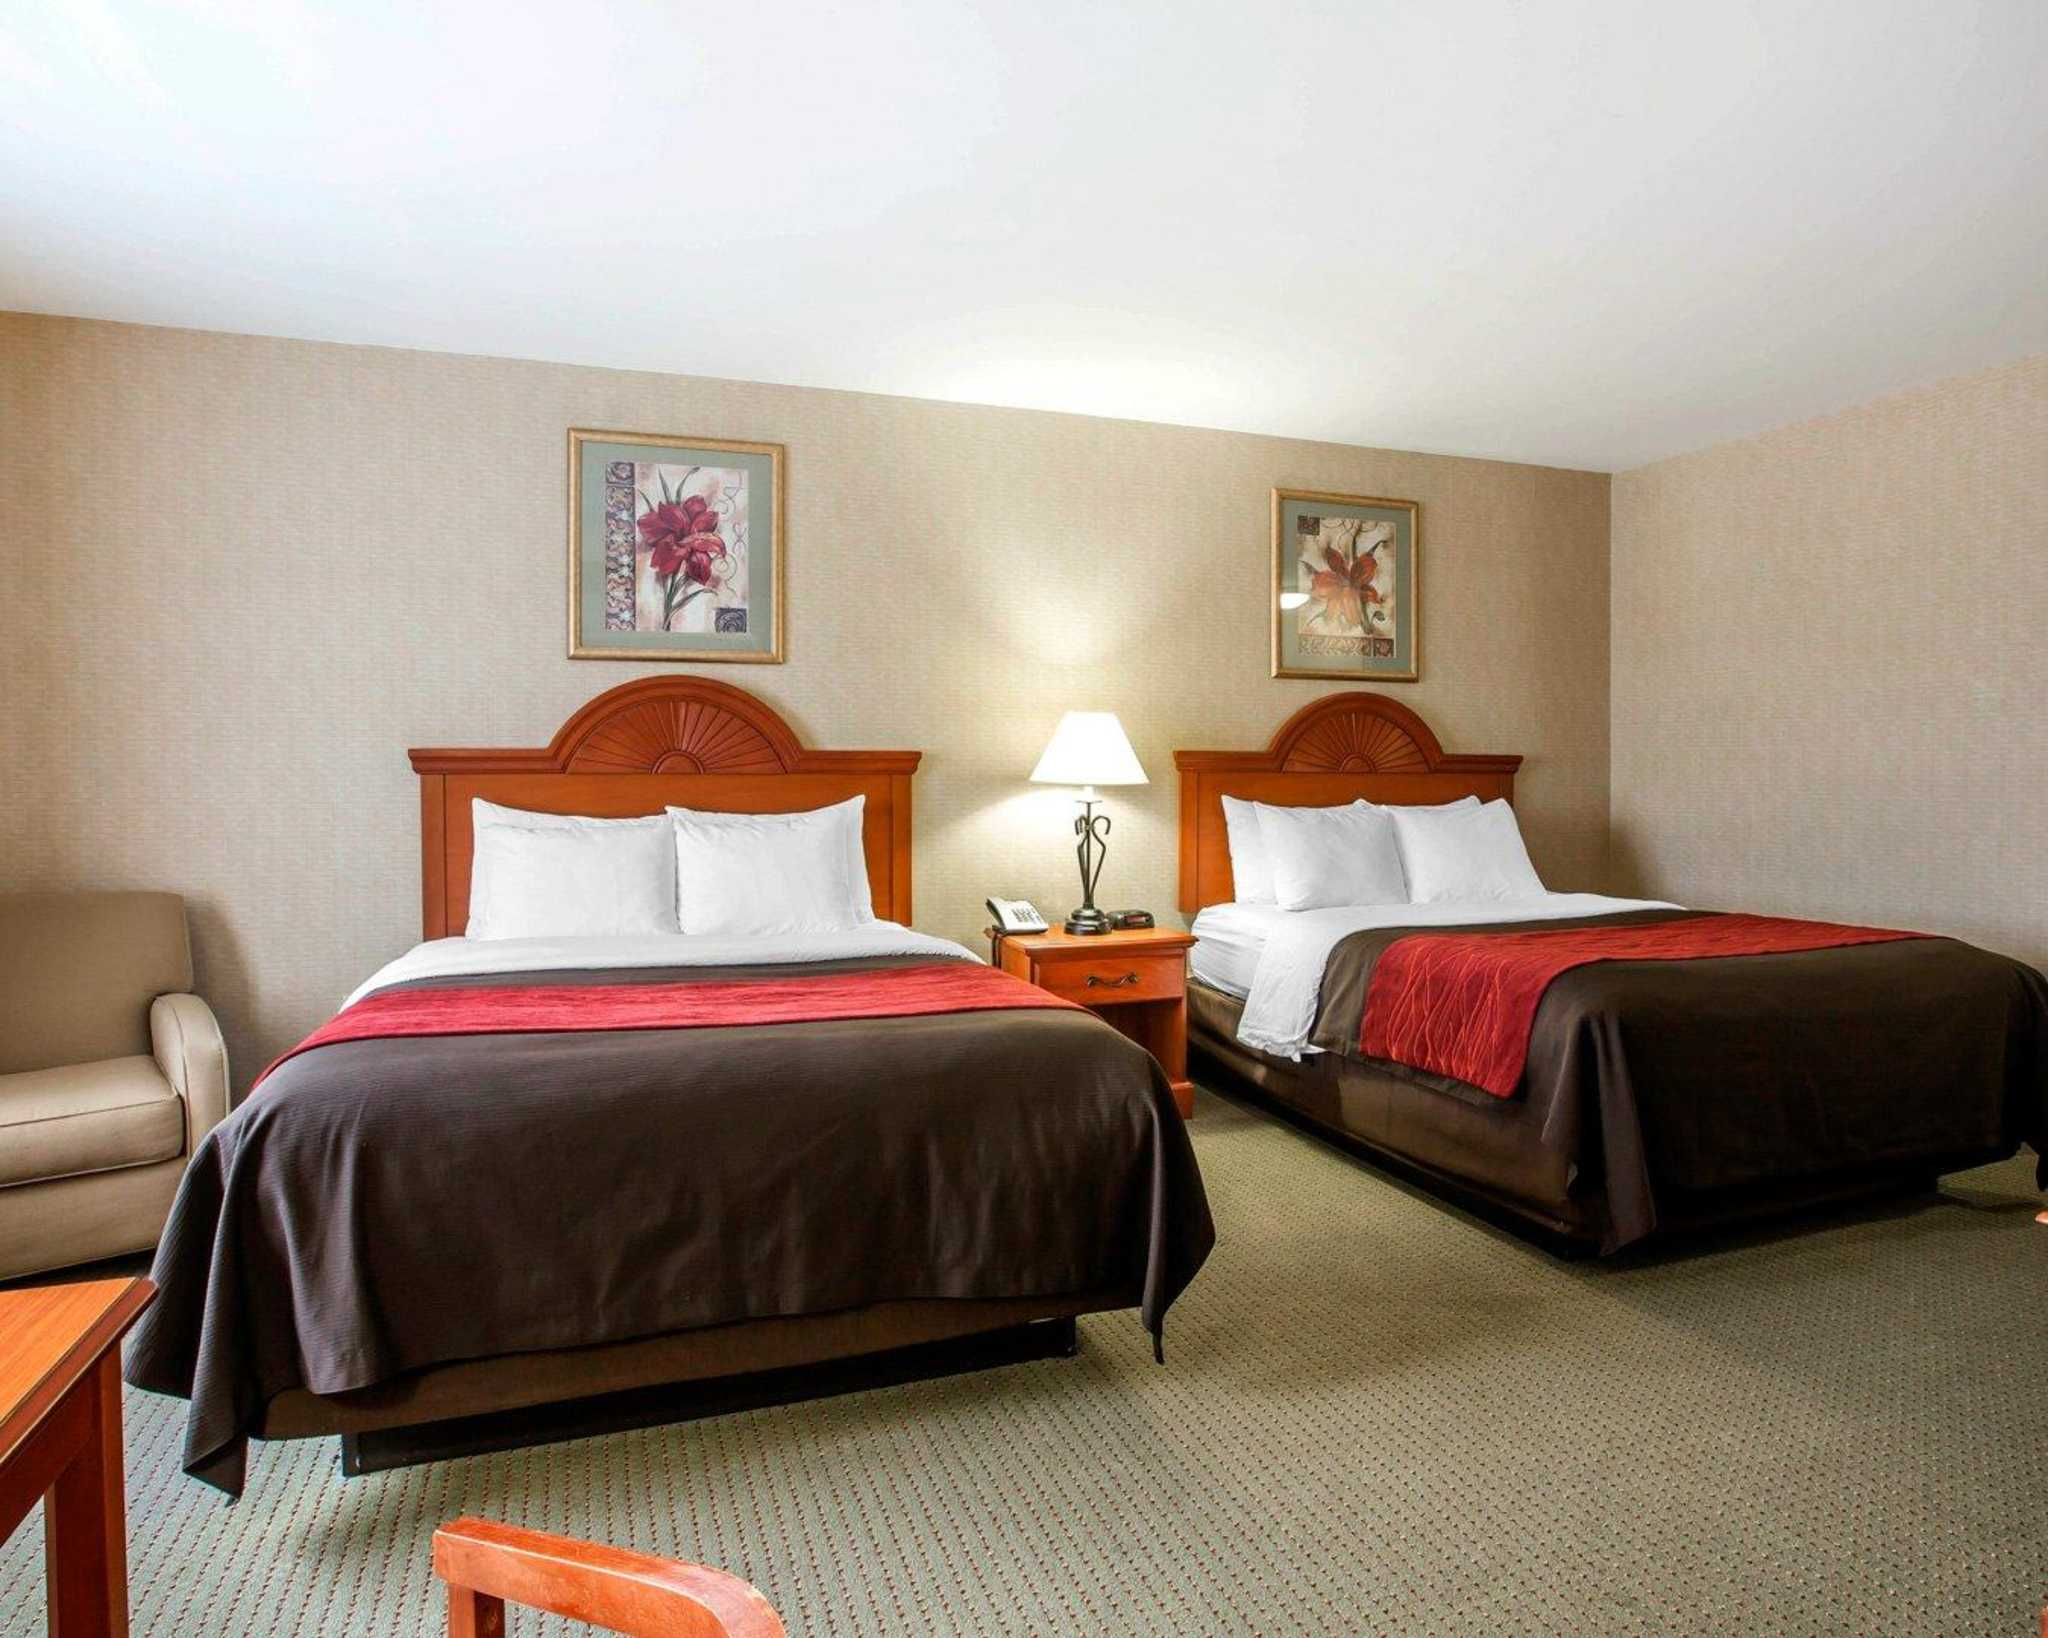 Comfort Inn & Suites adj to Akwesasne Mohawk Casino image 41